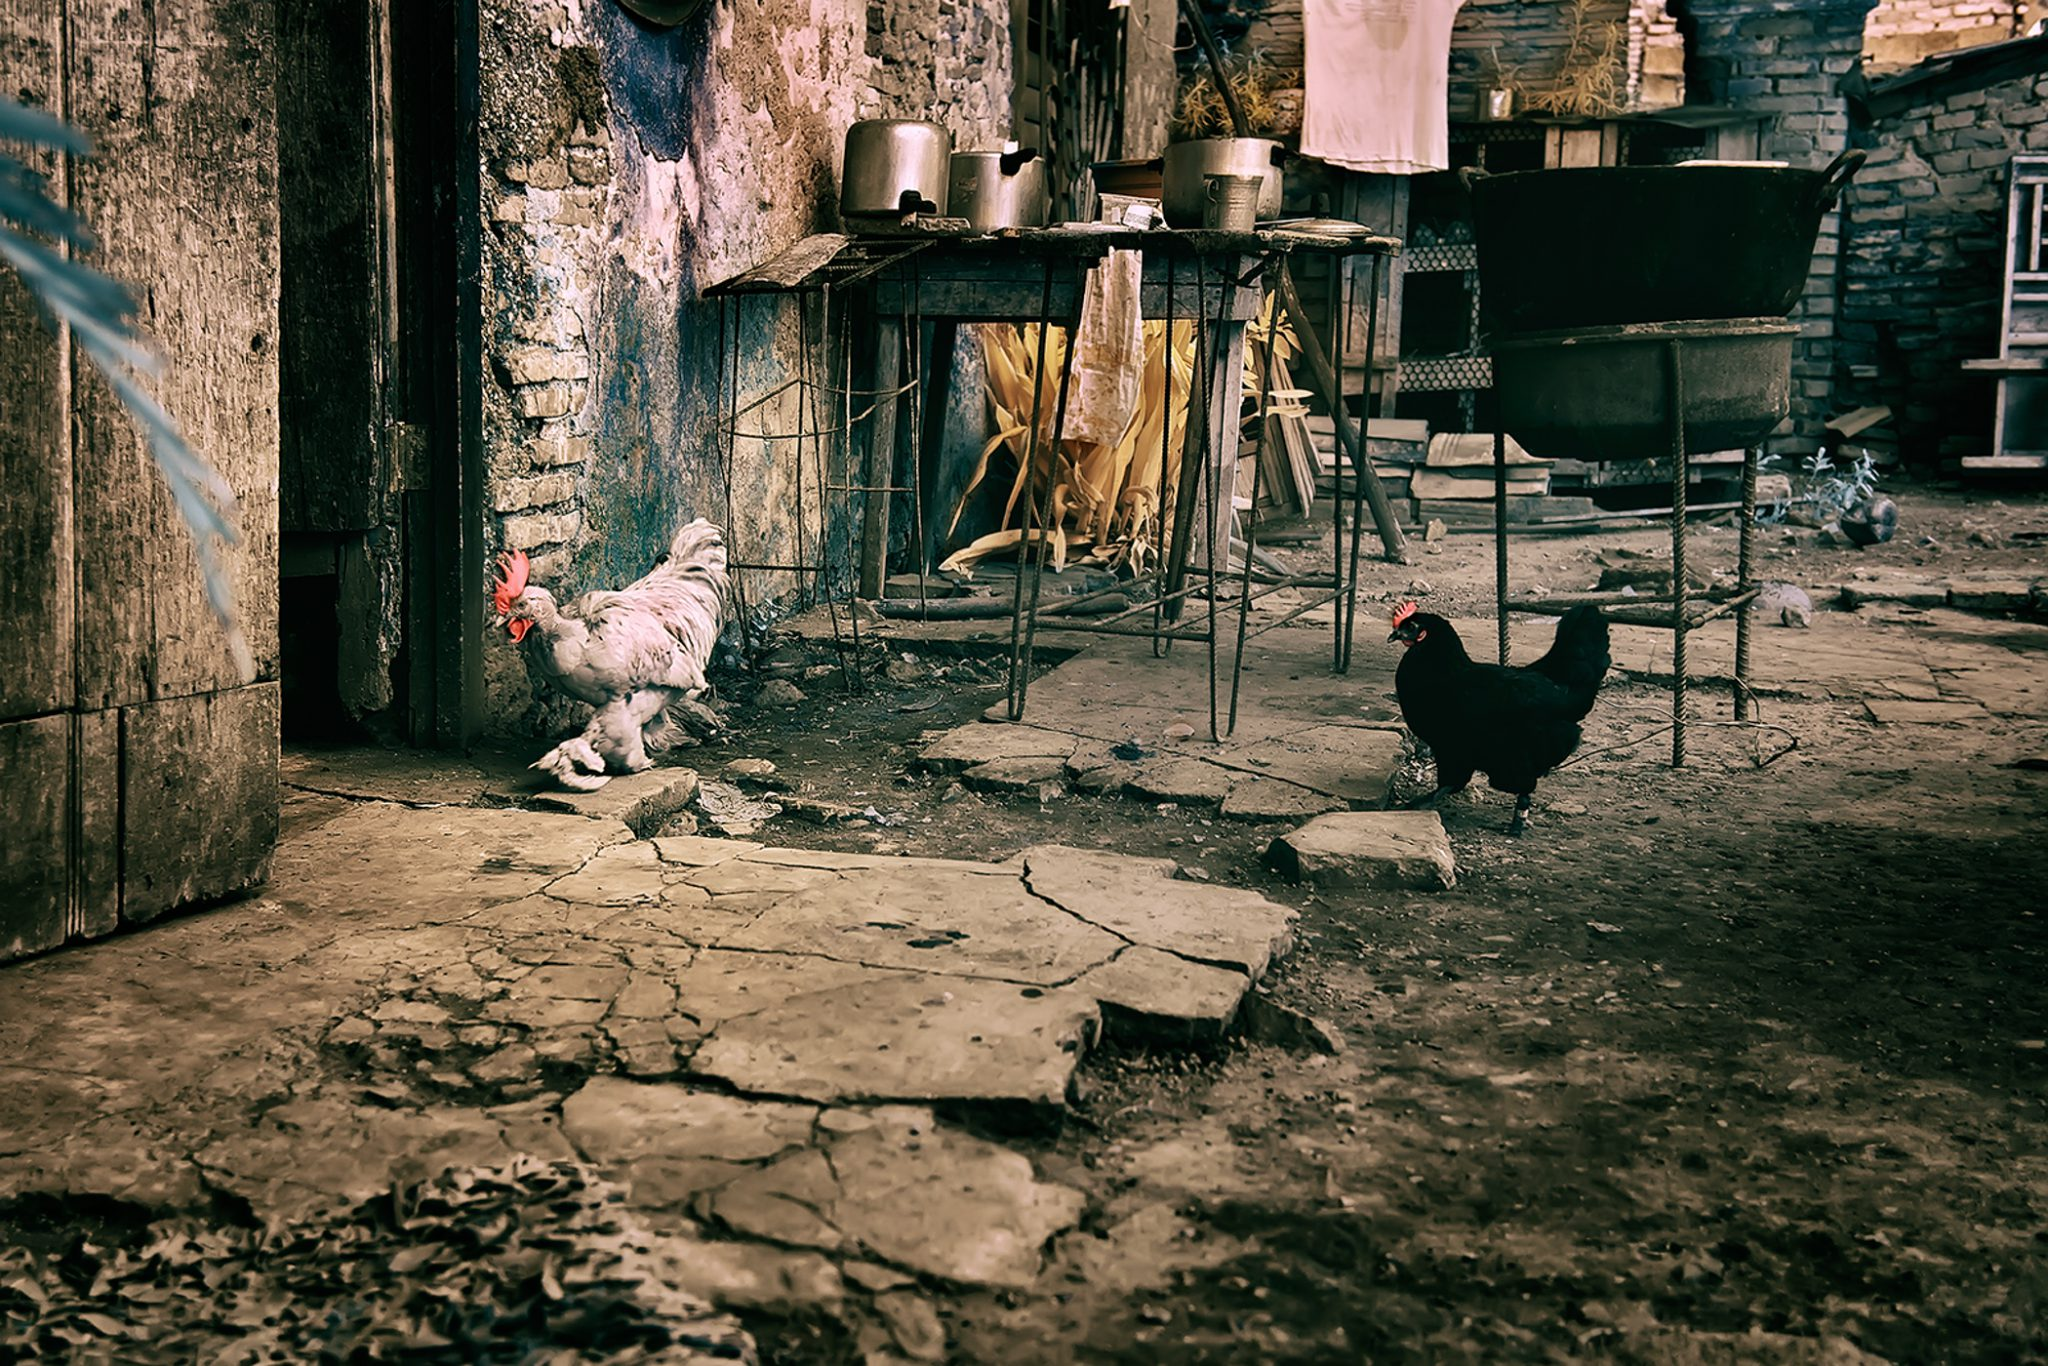 Roosters In the Kitchen 2/15 © EK Waller